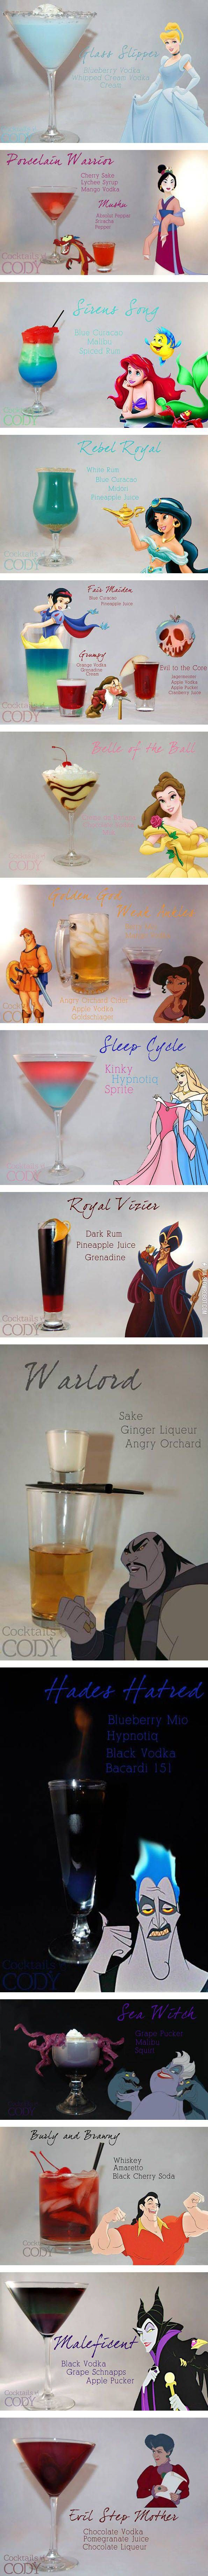 Do It Yourself: Disney princess cocktails!